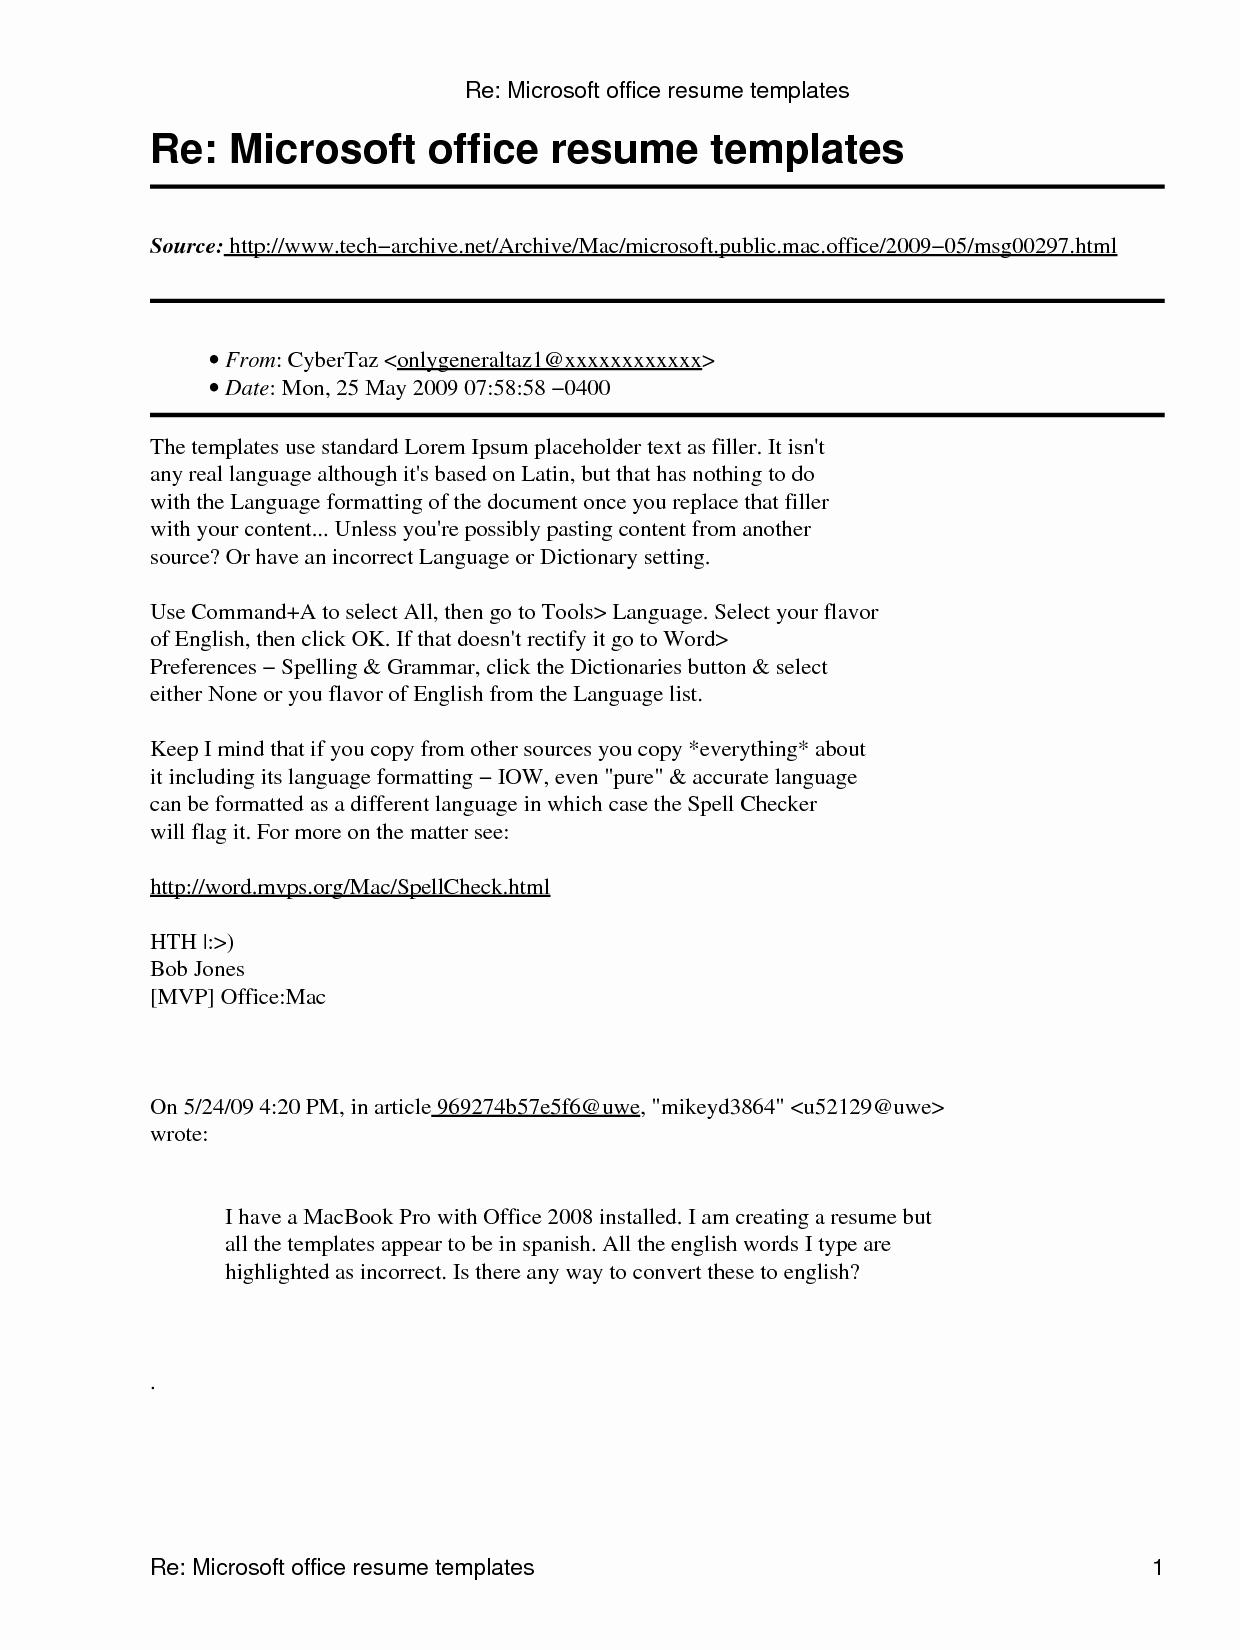 Microsoft Word Free Resume Templates Elegant Microsoft Fice Resume Template Umecareer